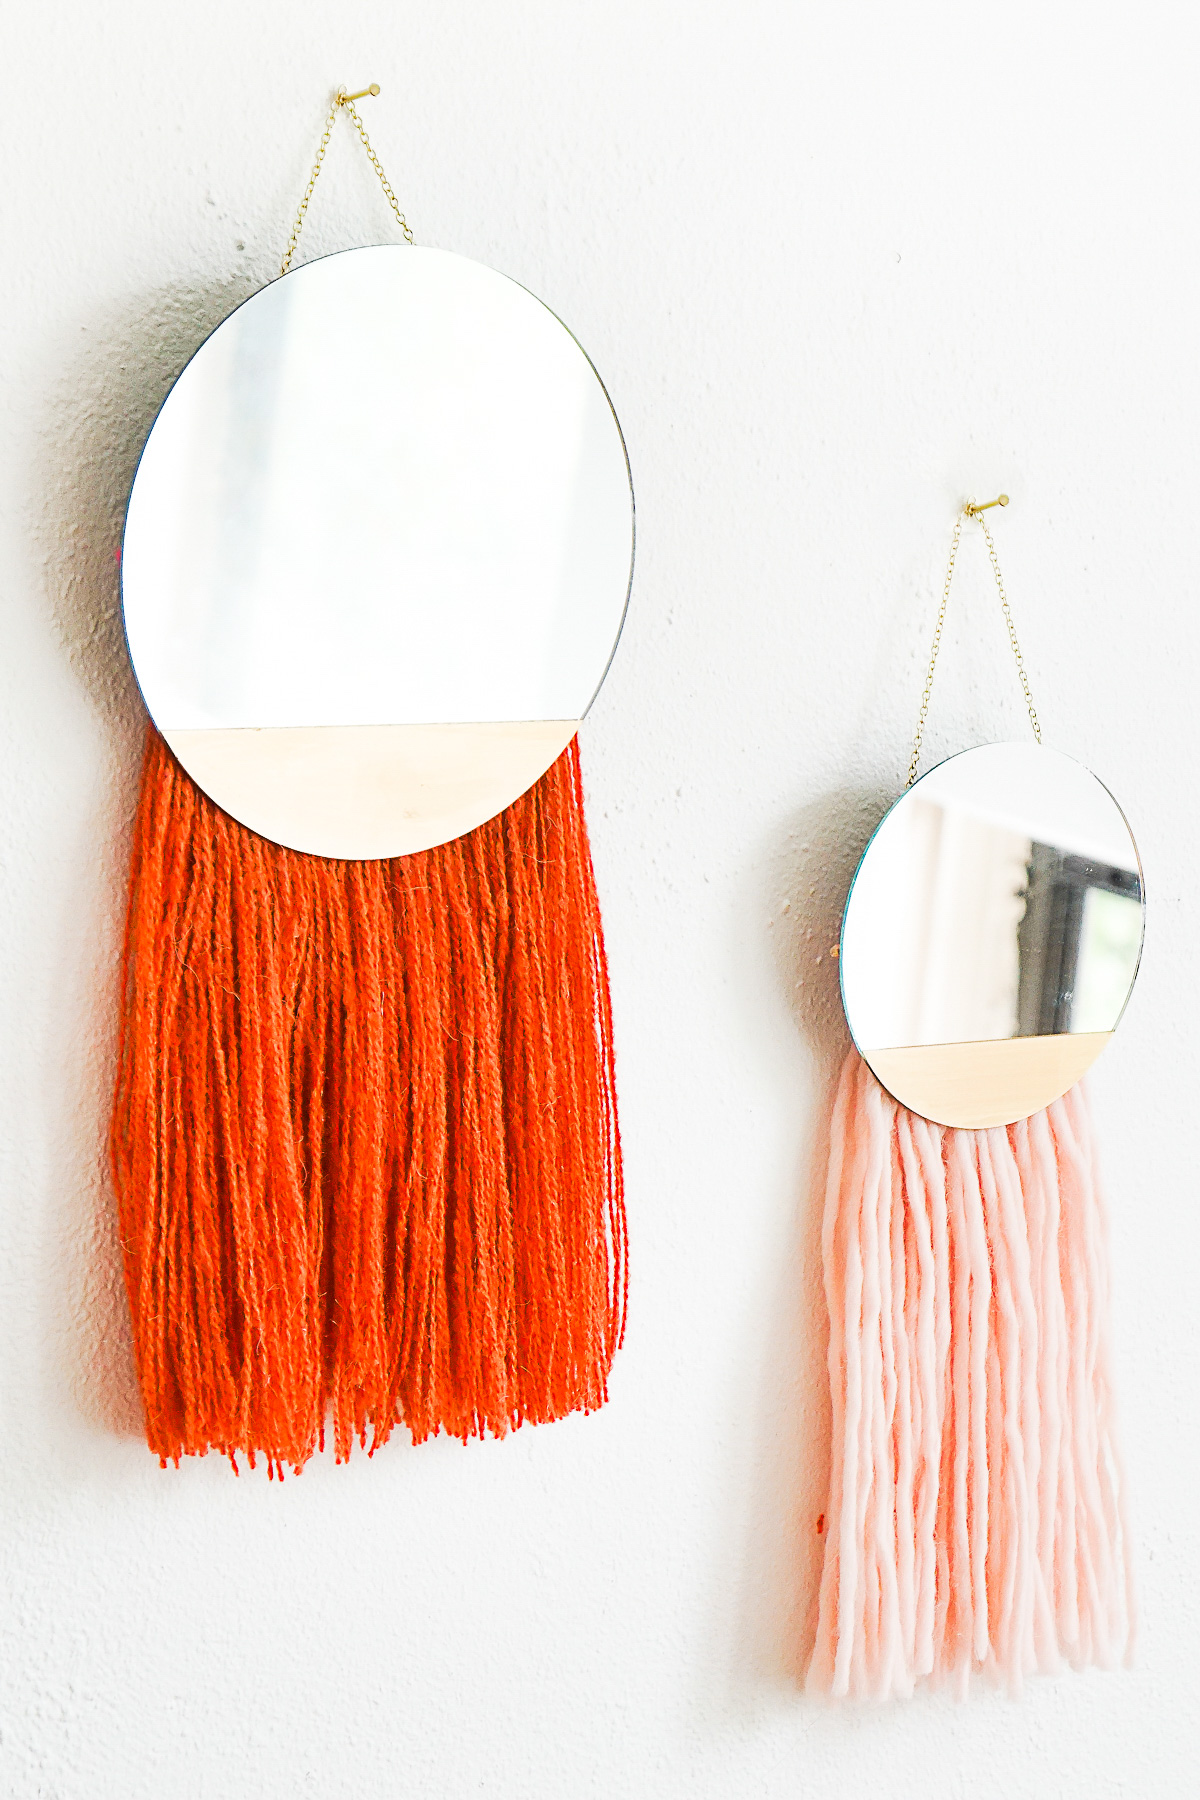 Fringed-mirror-wall-hanging-from-Sugar-Cloth